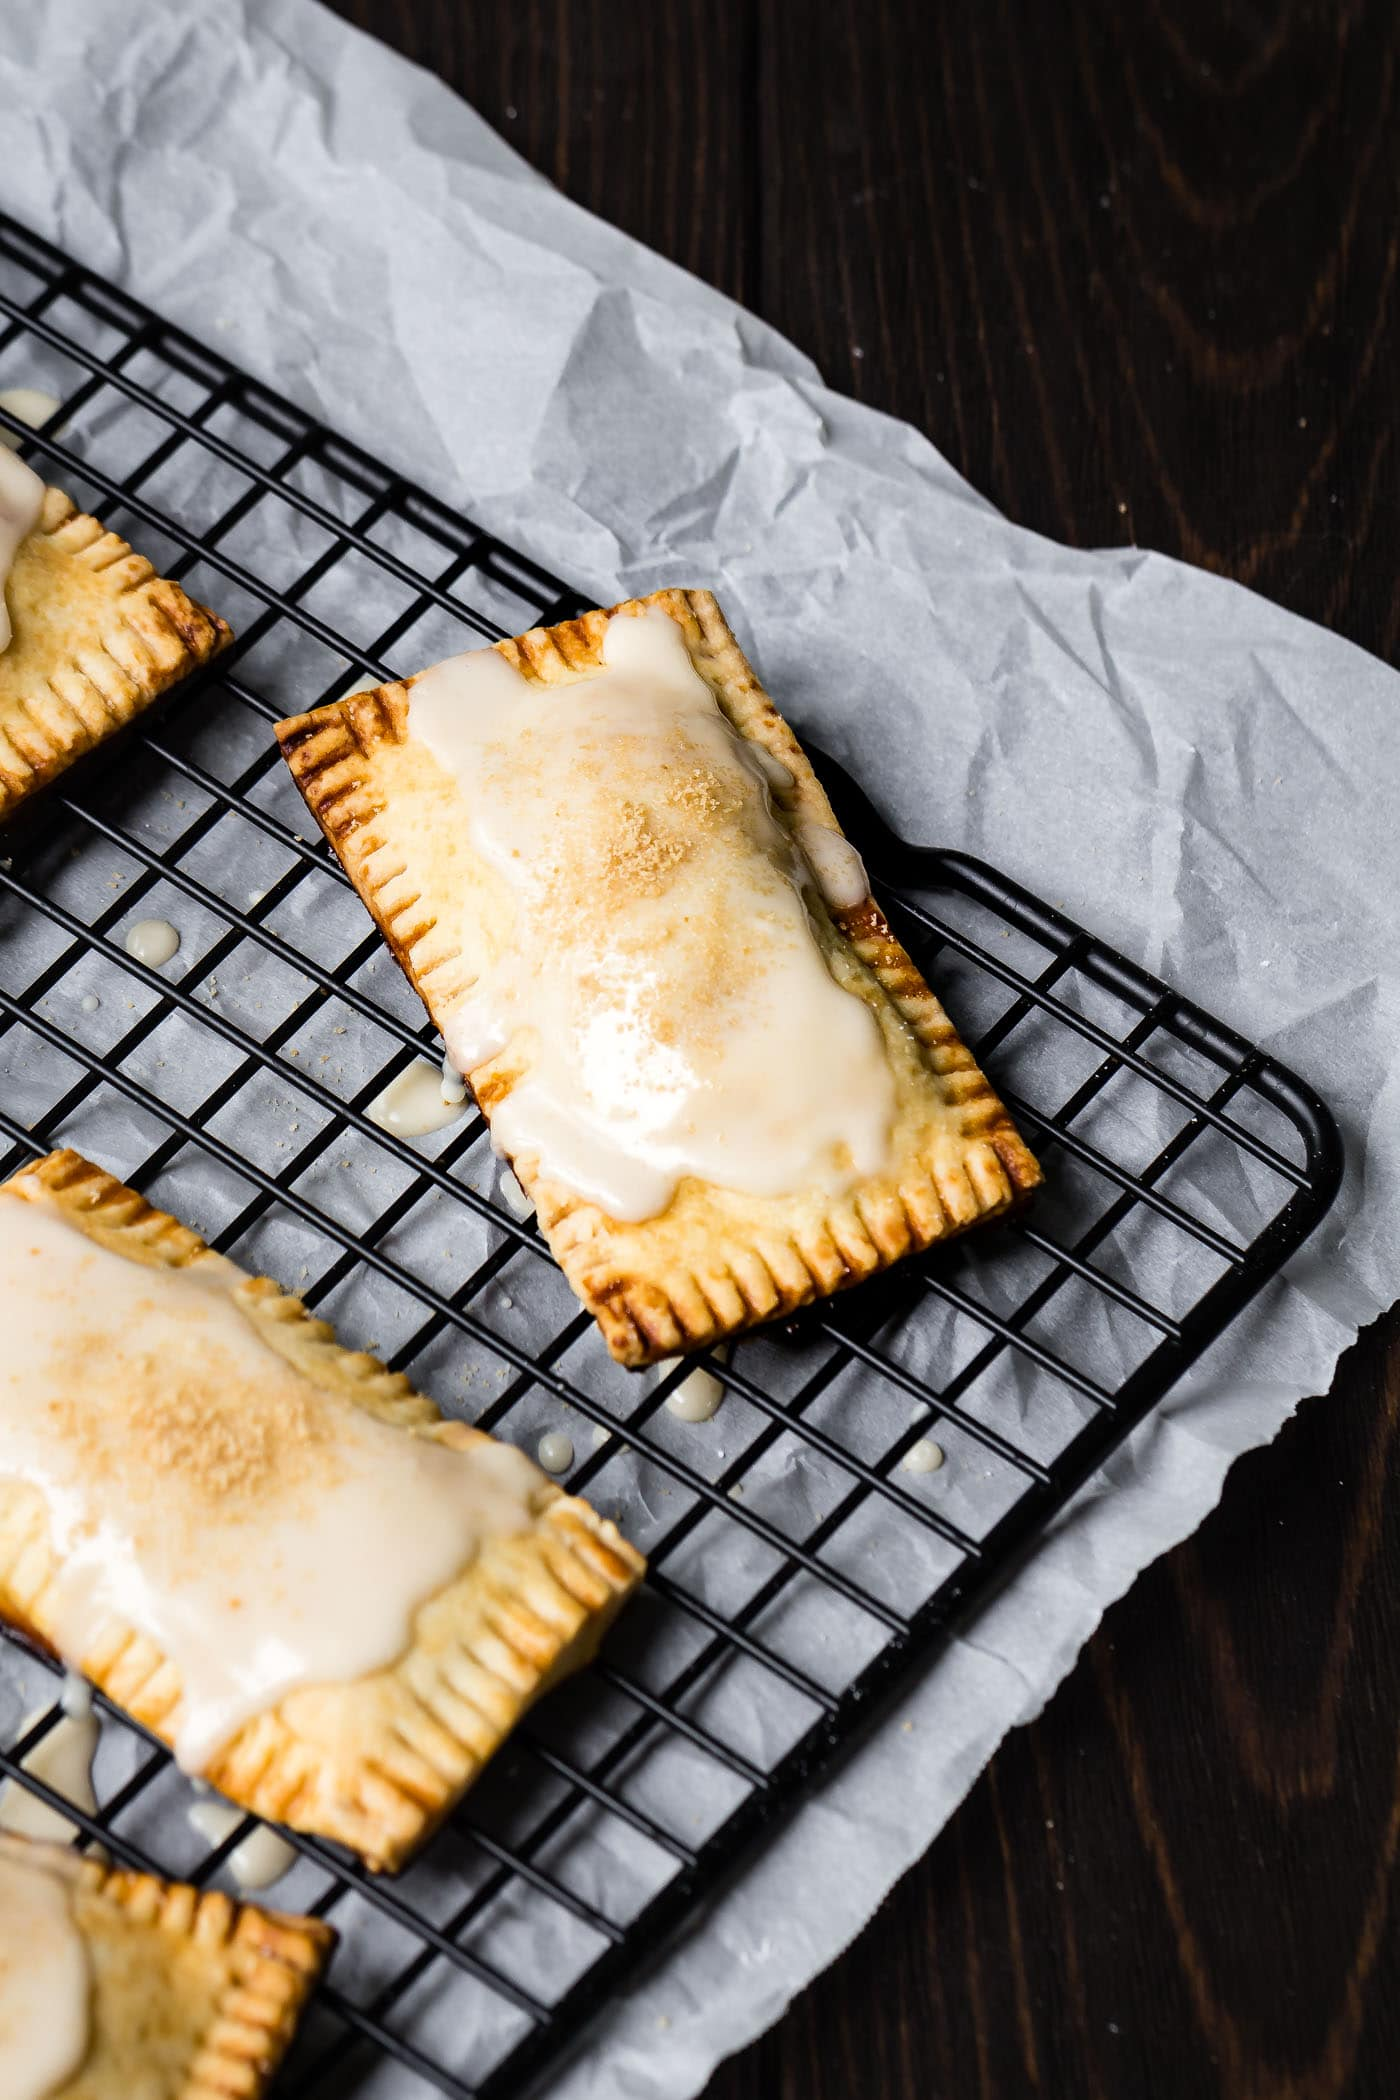 Trendy Freshly Glazed Vegan Maple Pumpkin Pop Tarts On A Ing Rack Vegan Maple Pumpkin Pop Tarts Recipe Le Petit Eats Are Cinnamon Roll Pop Tarts Vegan Are Pop Tarts Vegan Peta nice food Are Pop Tarts Vegan